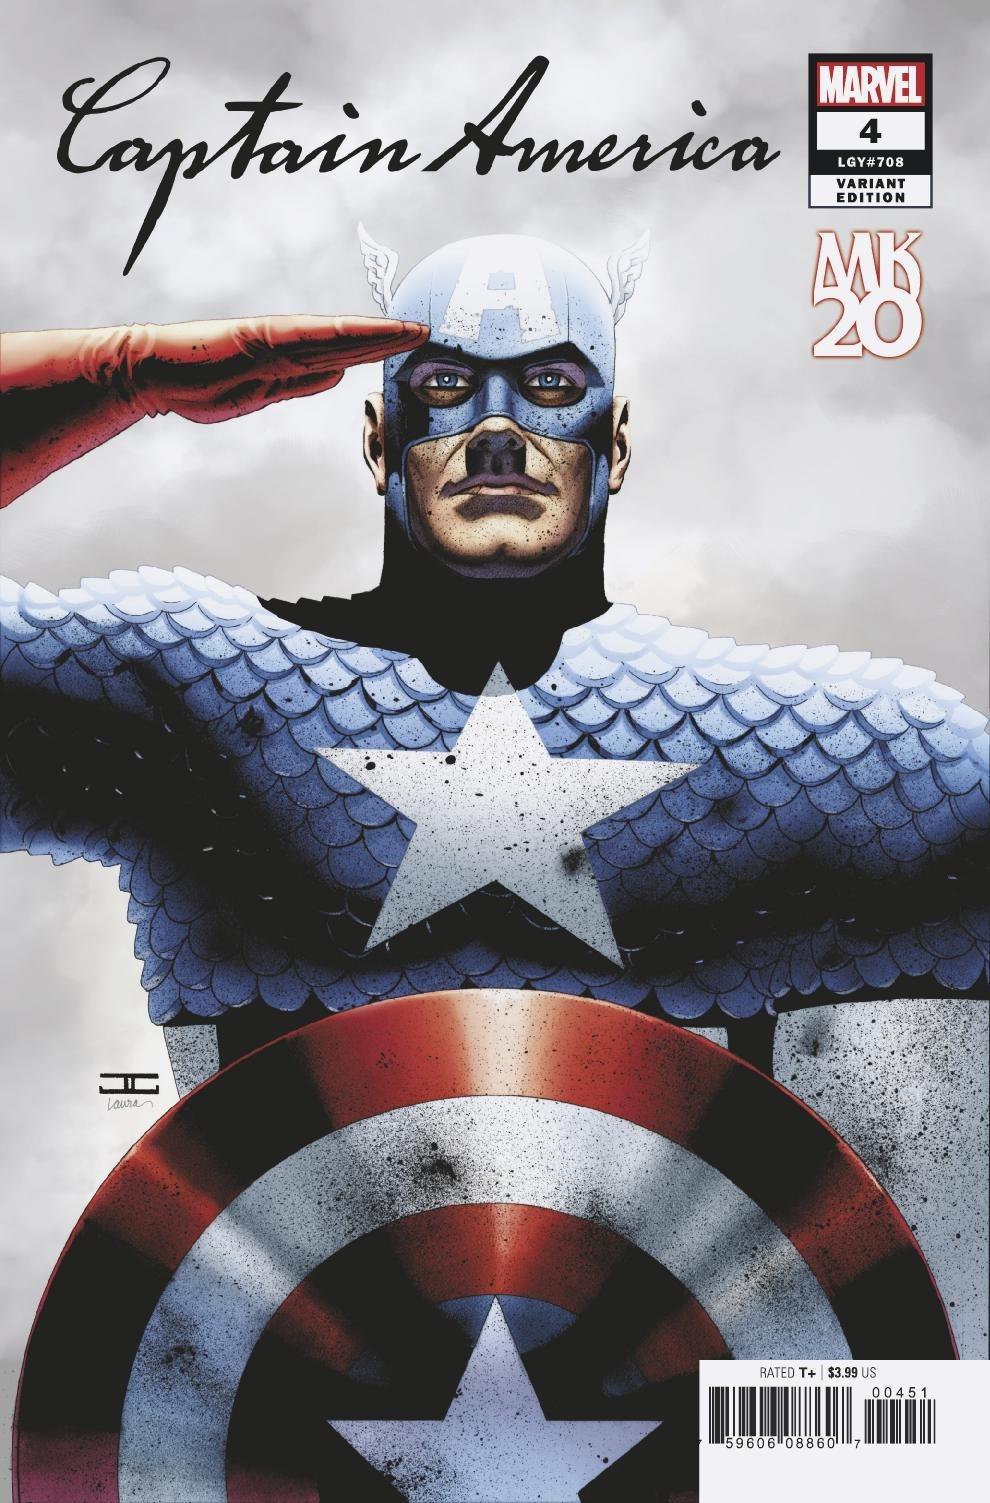 Captain America Vol 9 4 MK20 Variant.jpg